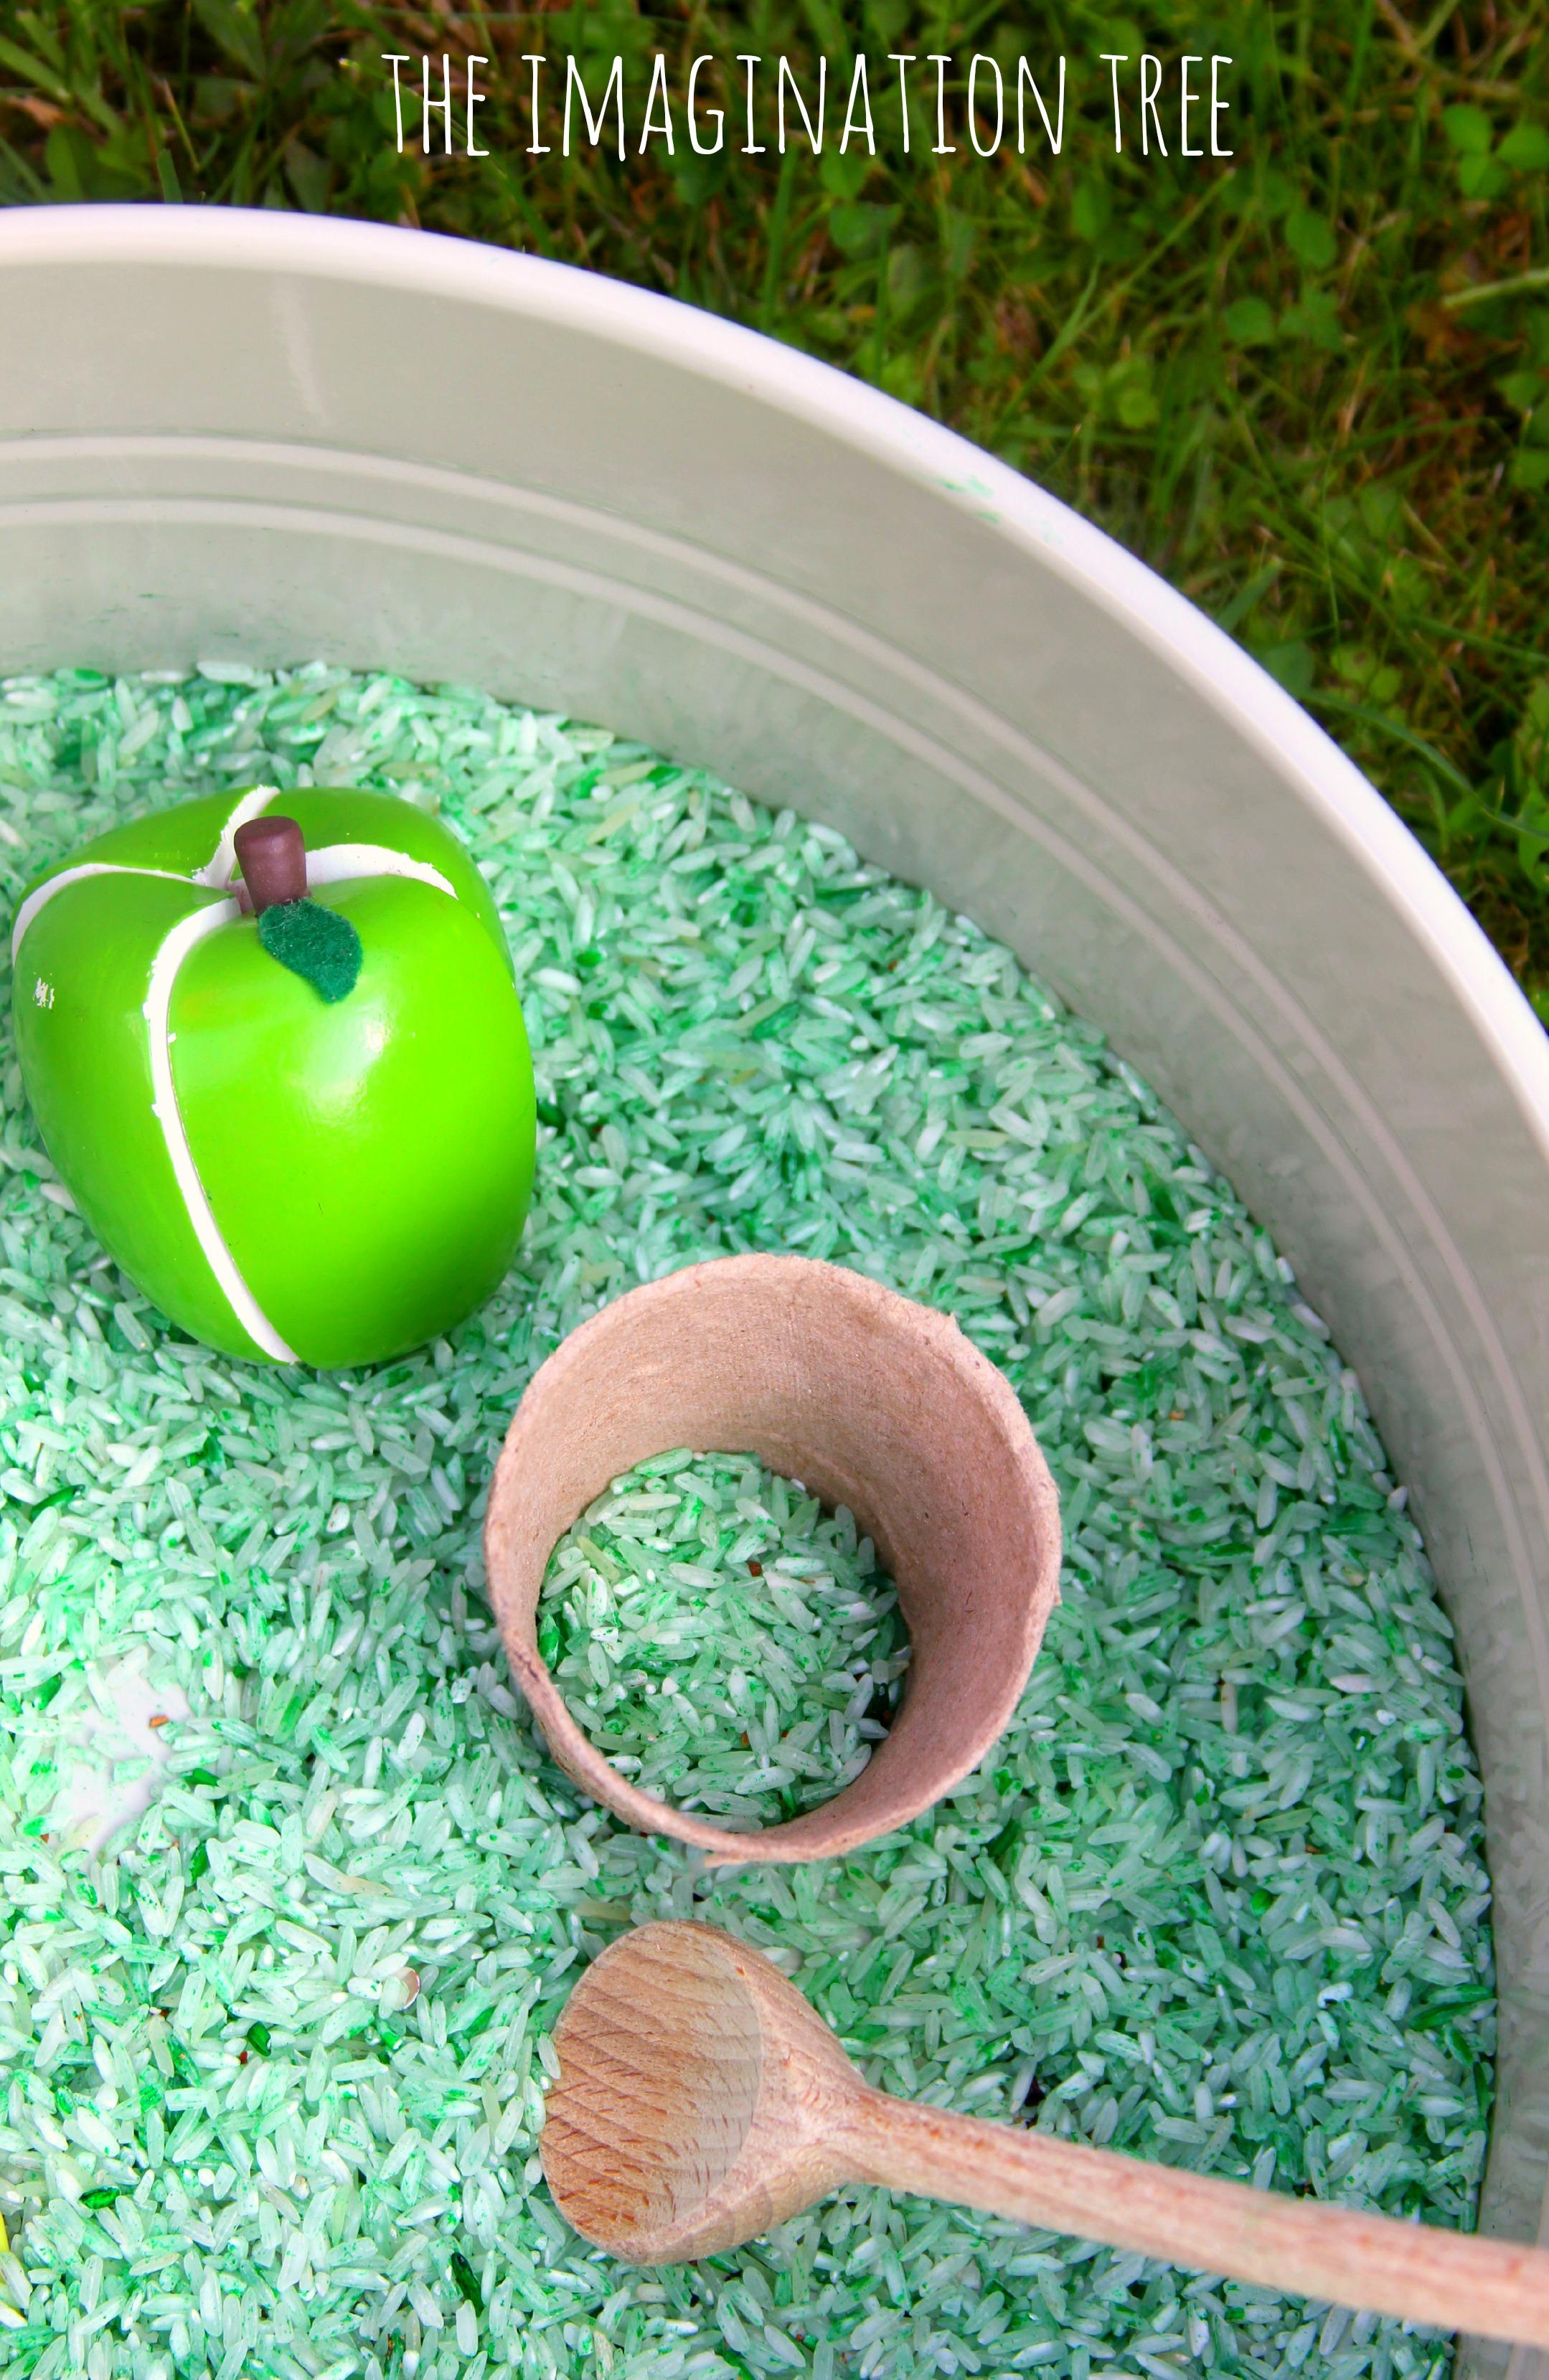 Apple Cinnamon Scented Sensory Rice The Imagination Tree